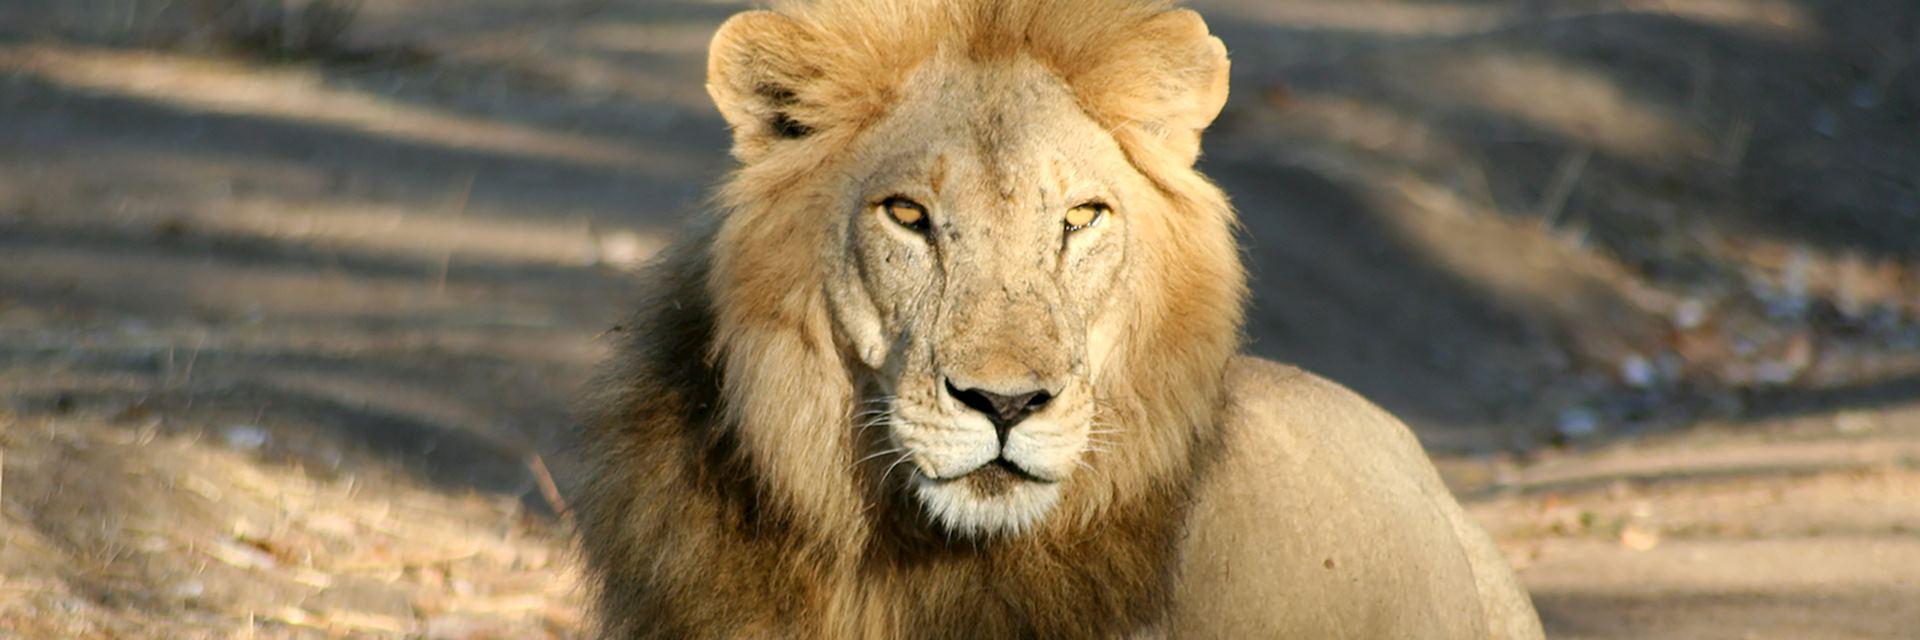 Lion, Ruaha National Park